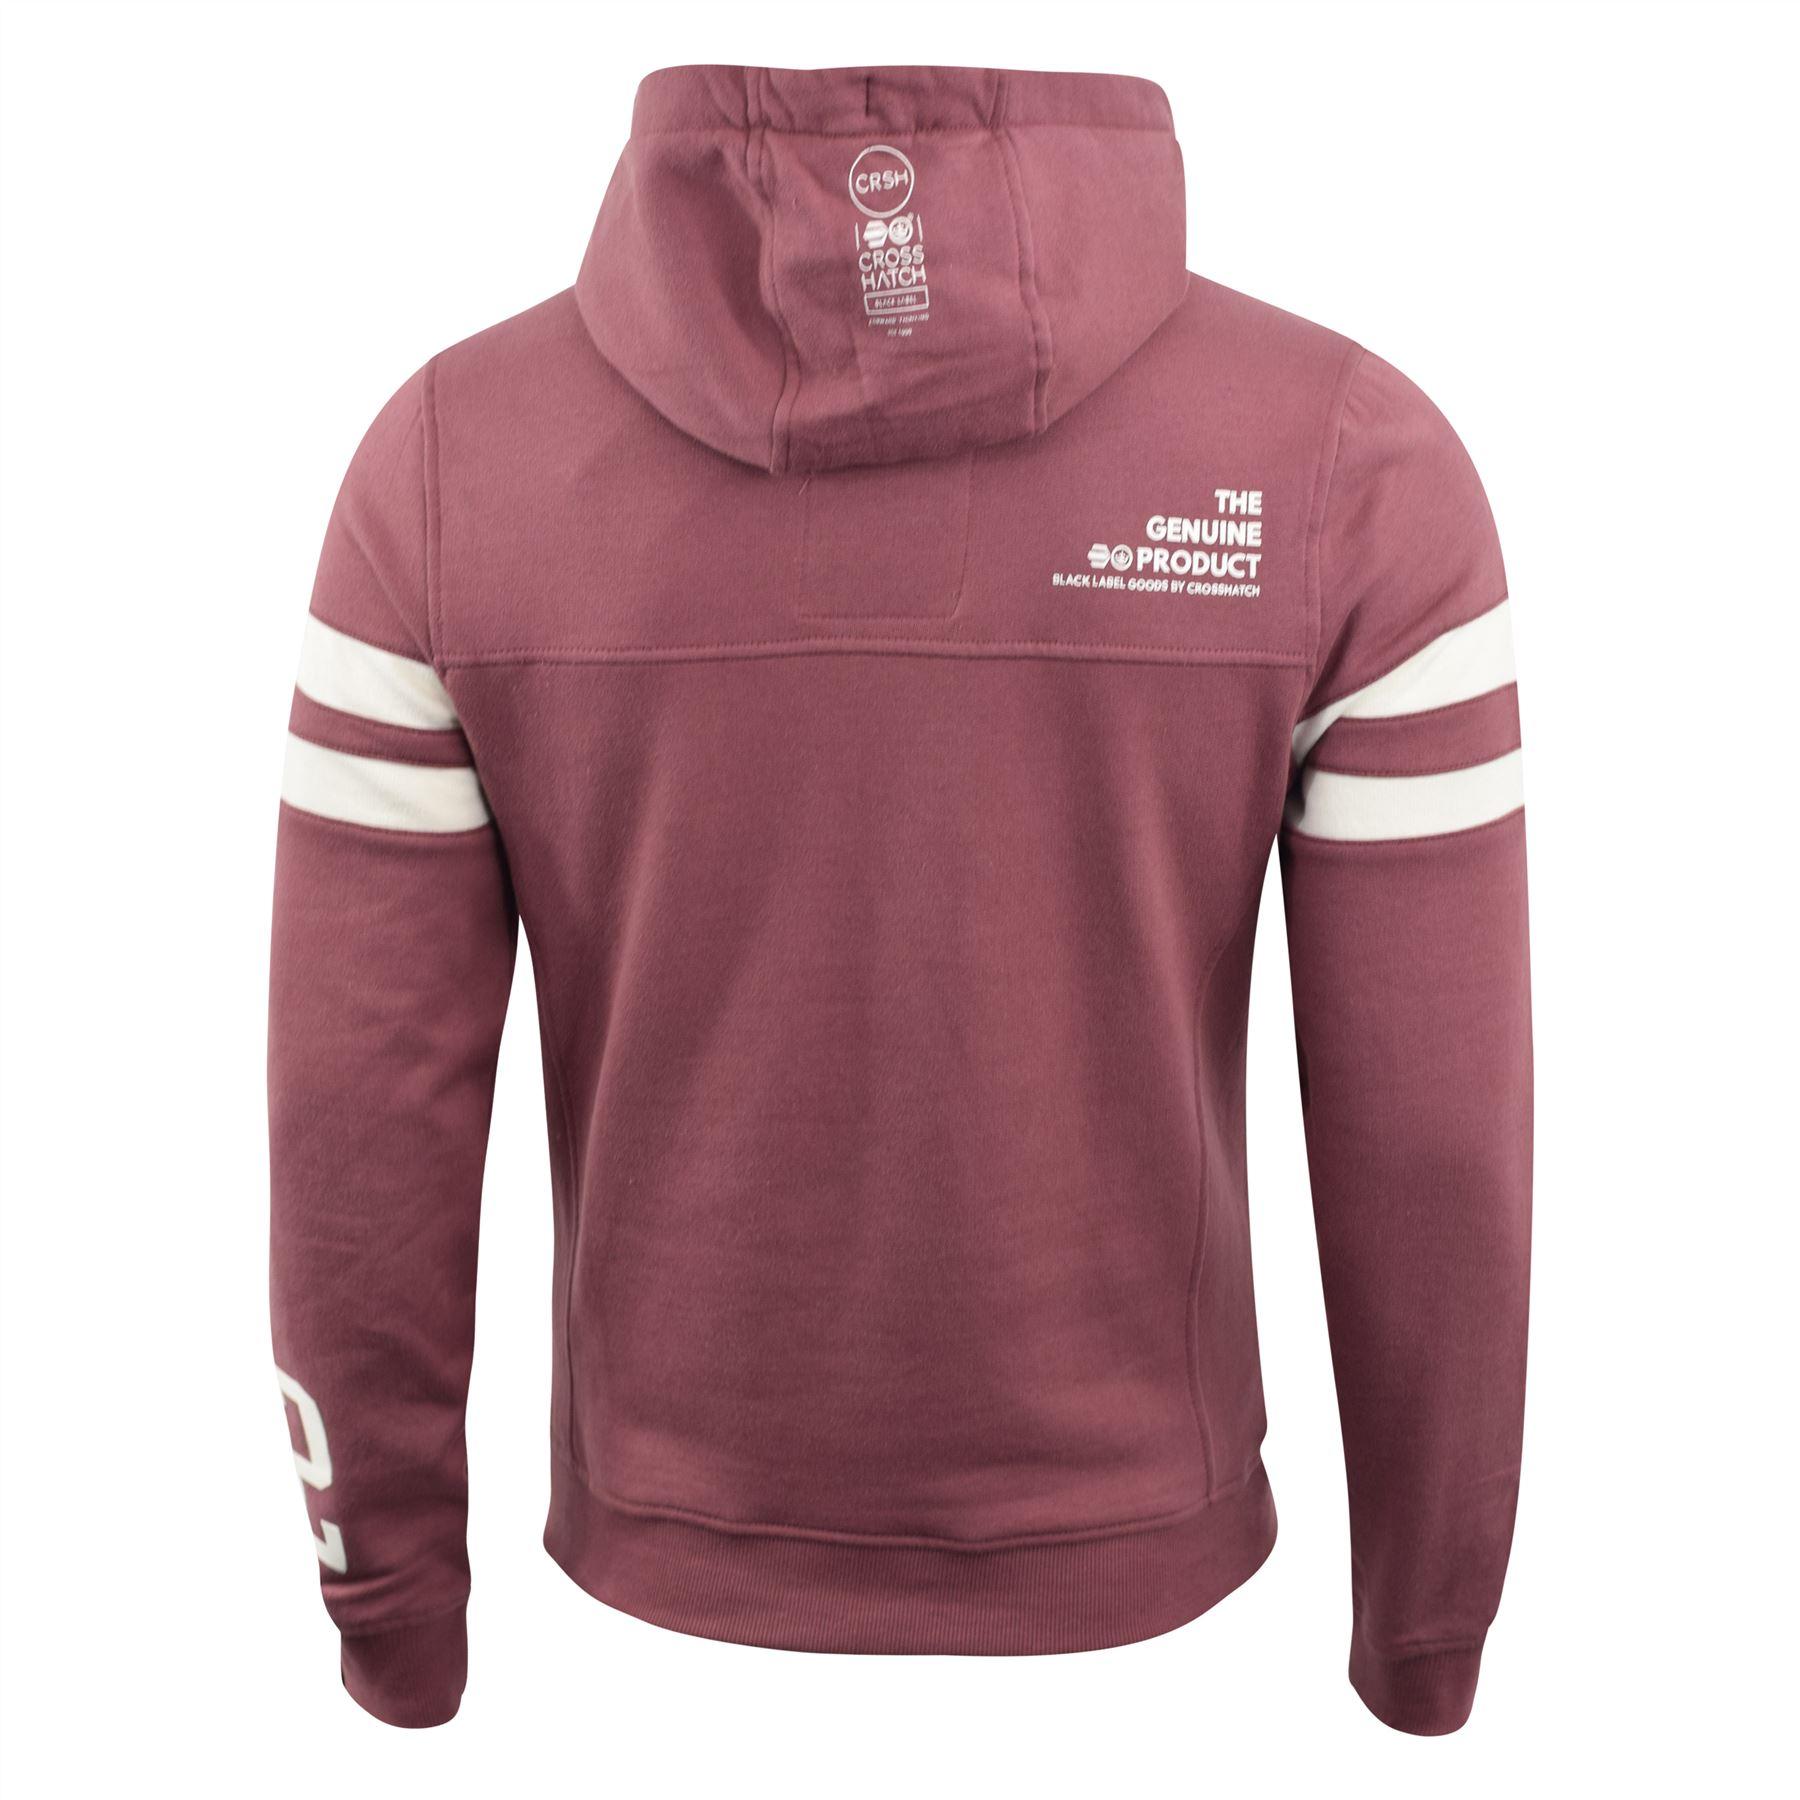 Mens-Hoodie-Crosshatch-Clothing-Sweatshirt-Hooded-Jumper-Top-Pullover-Cramform thumbnail 7